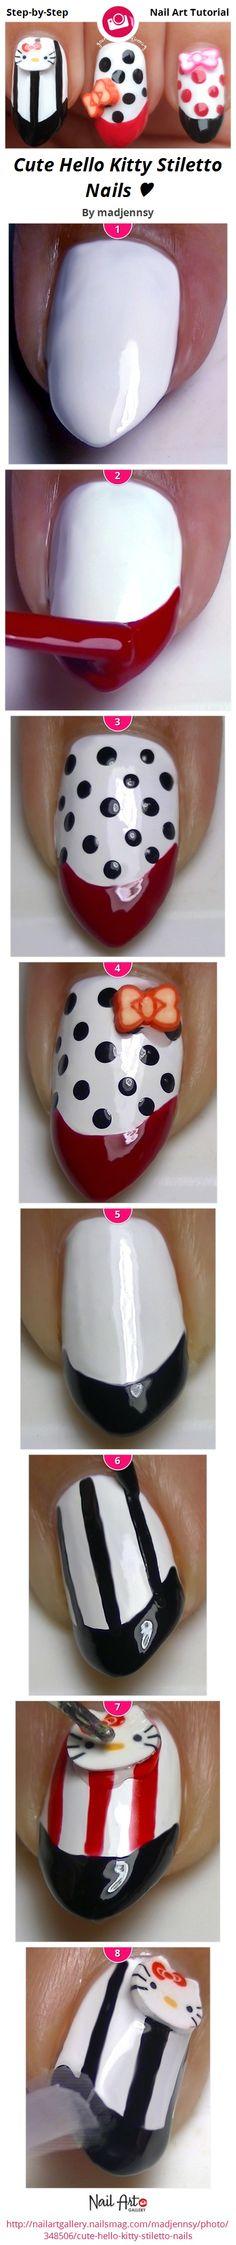 Cute Hello Kitty Stiletto Nails ♥ by madjennsy - Nail Art Gallery Step-by-Step Tutorials nailartgallery.nailsmag.com by Nails Magazine www.nailsmag.com #nailart